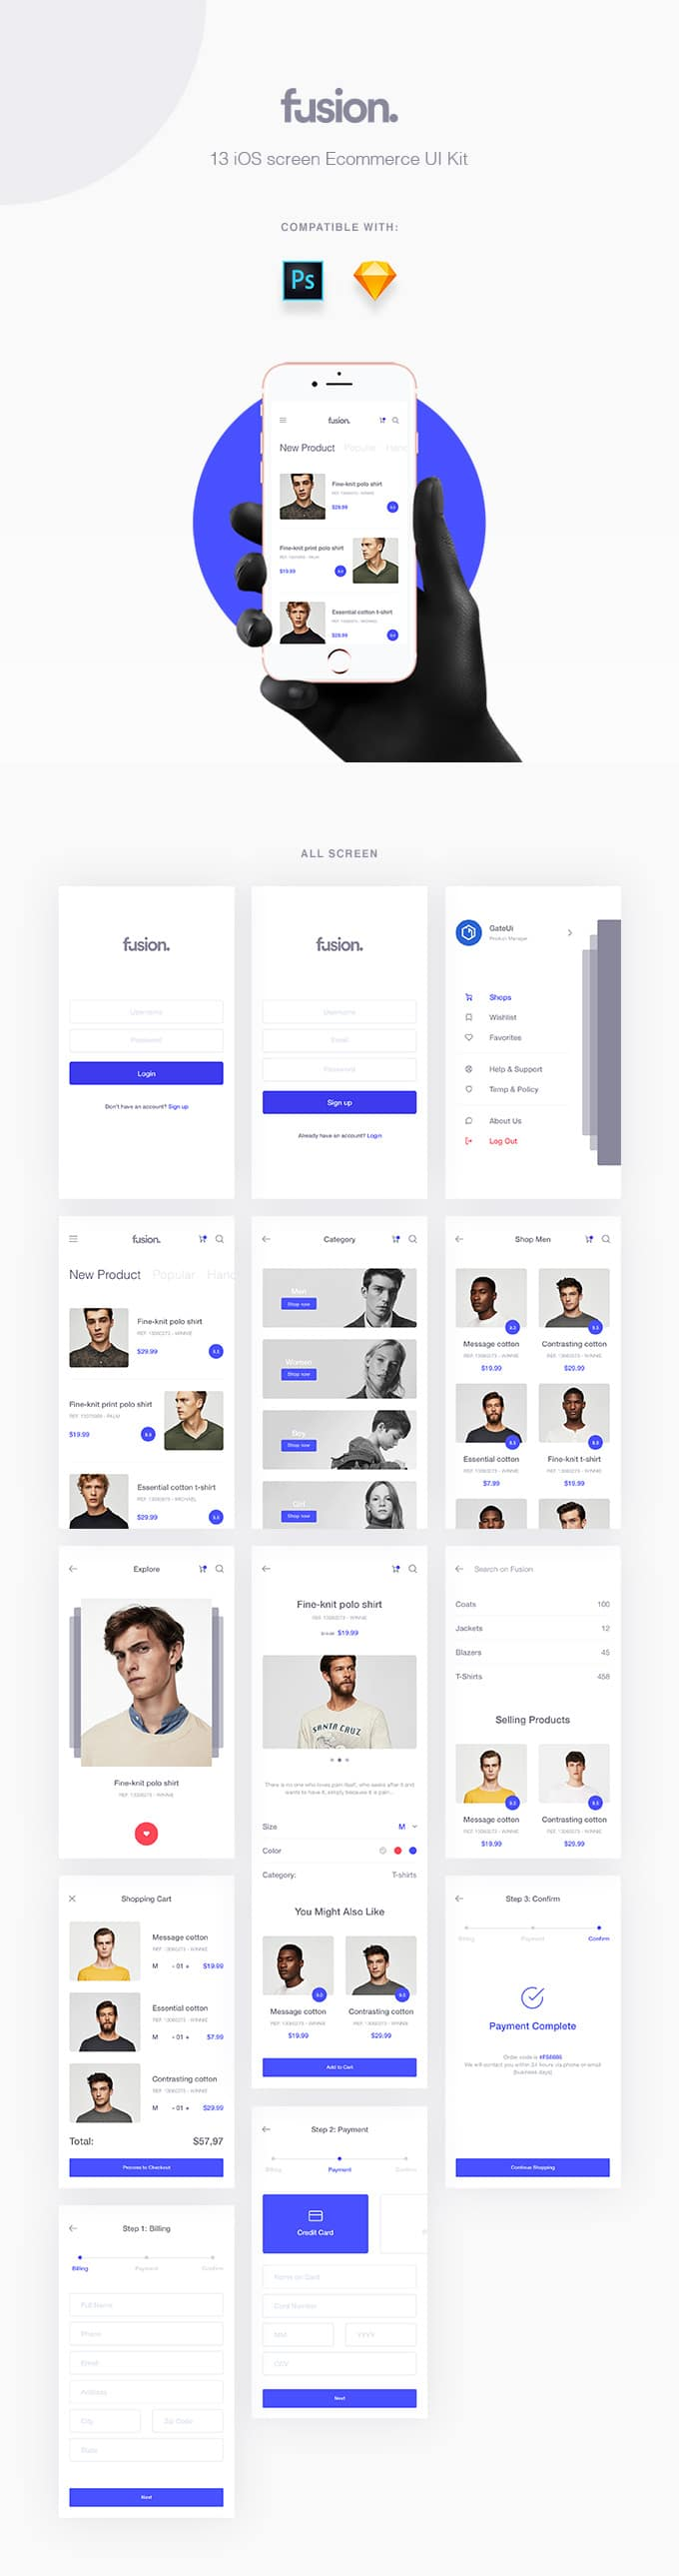 Fusion E-commerce UI Kit — download free ui kits by PixelBuddha